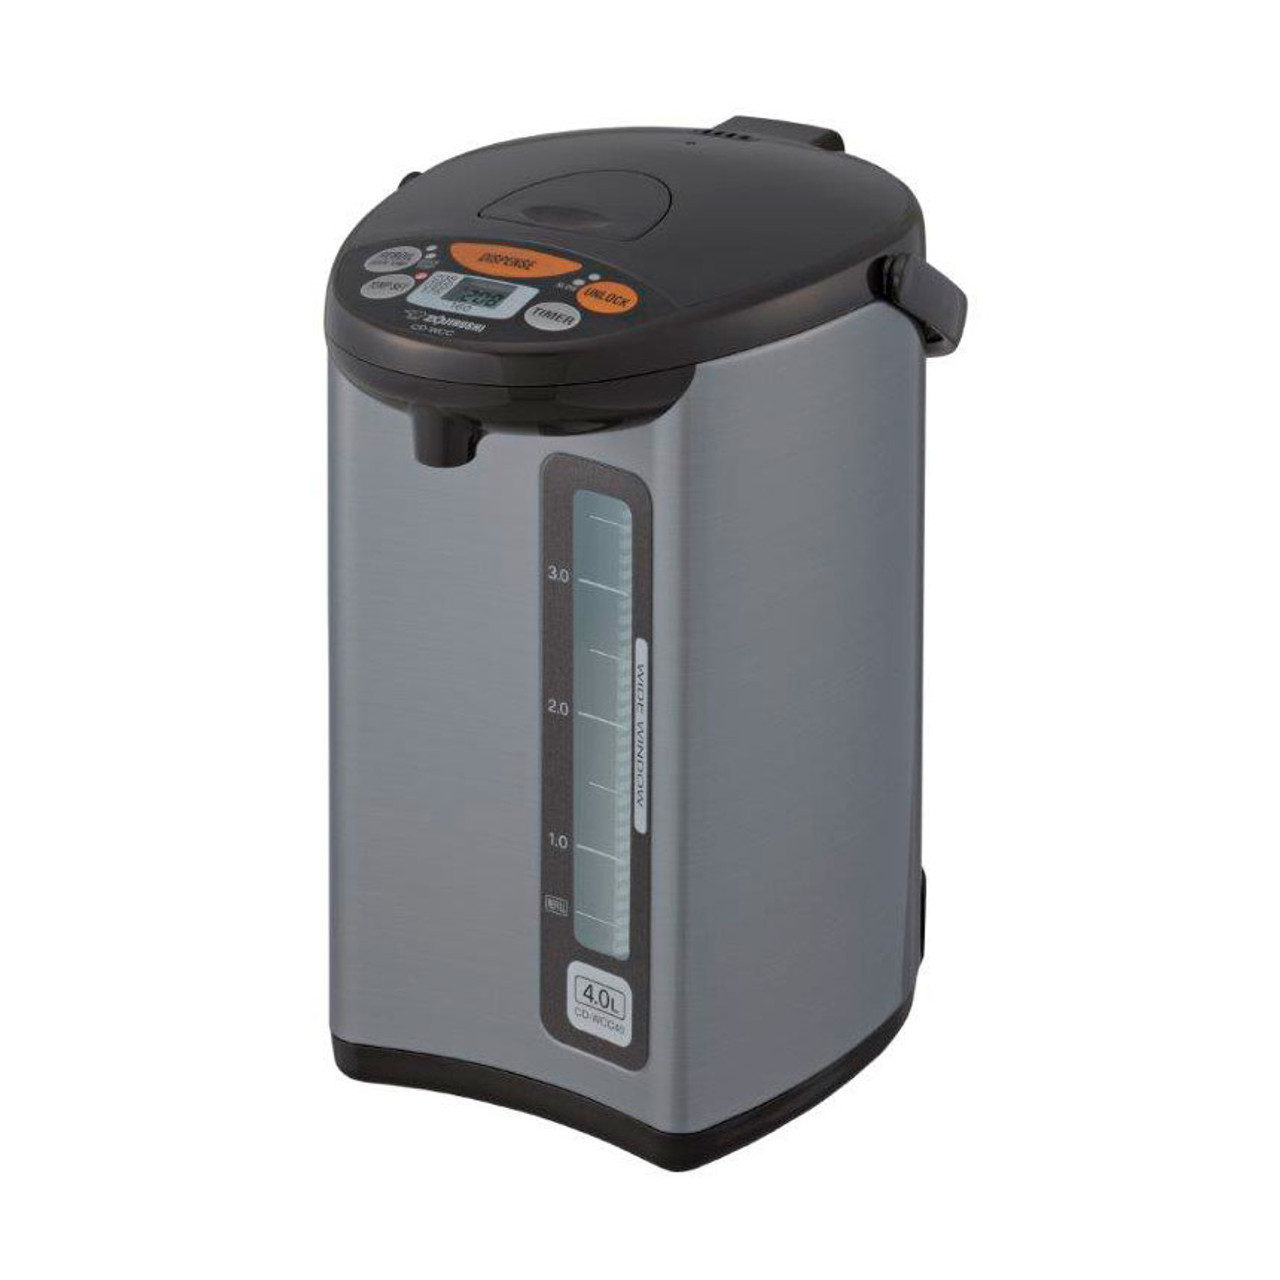 Zojirushi 4L Micom Water Boiler & Warmer CD-WCC40